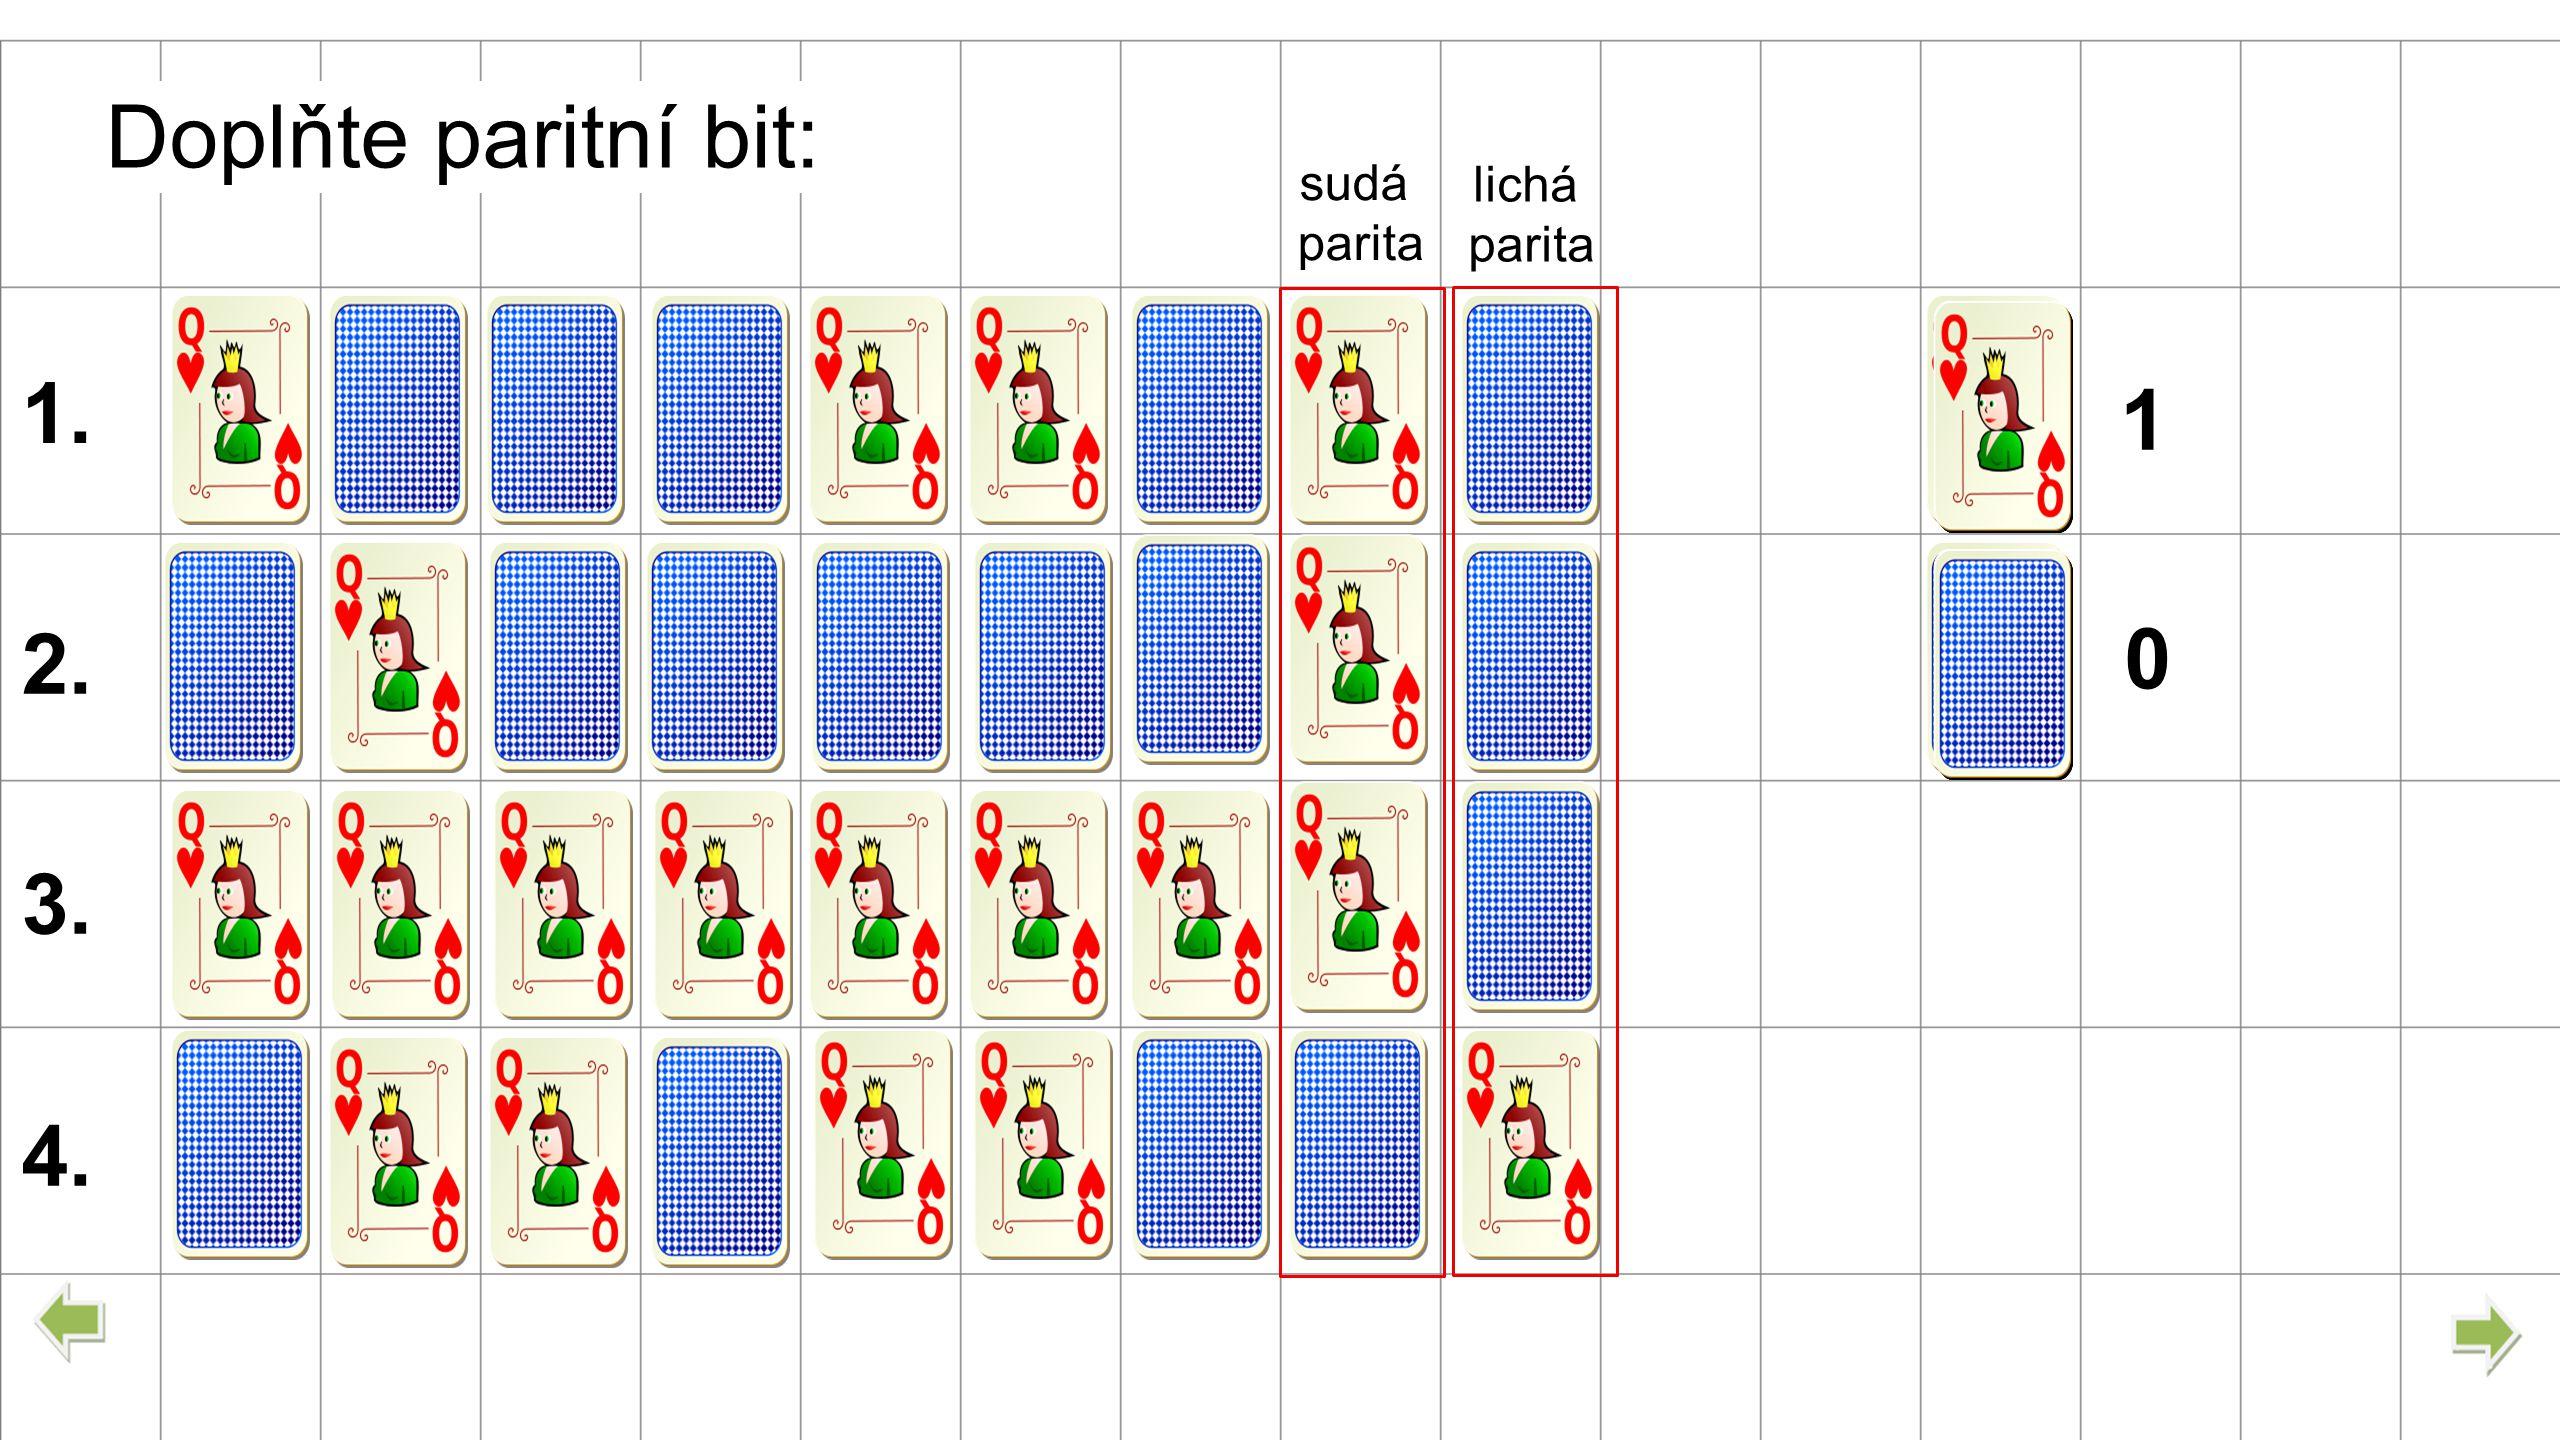 0 1 1. Doplňte paritní bit: 2. 3. 4. sudá parita lichá parita